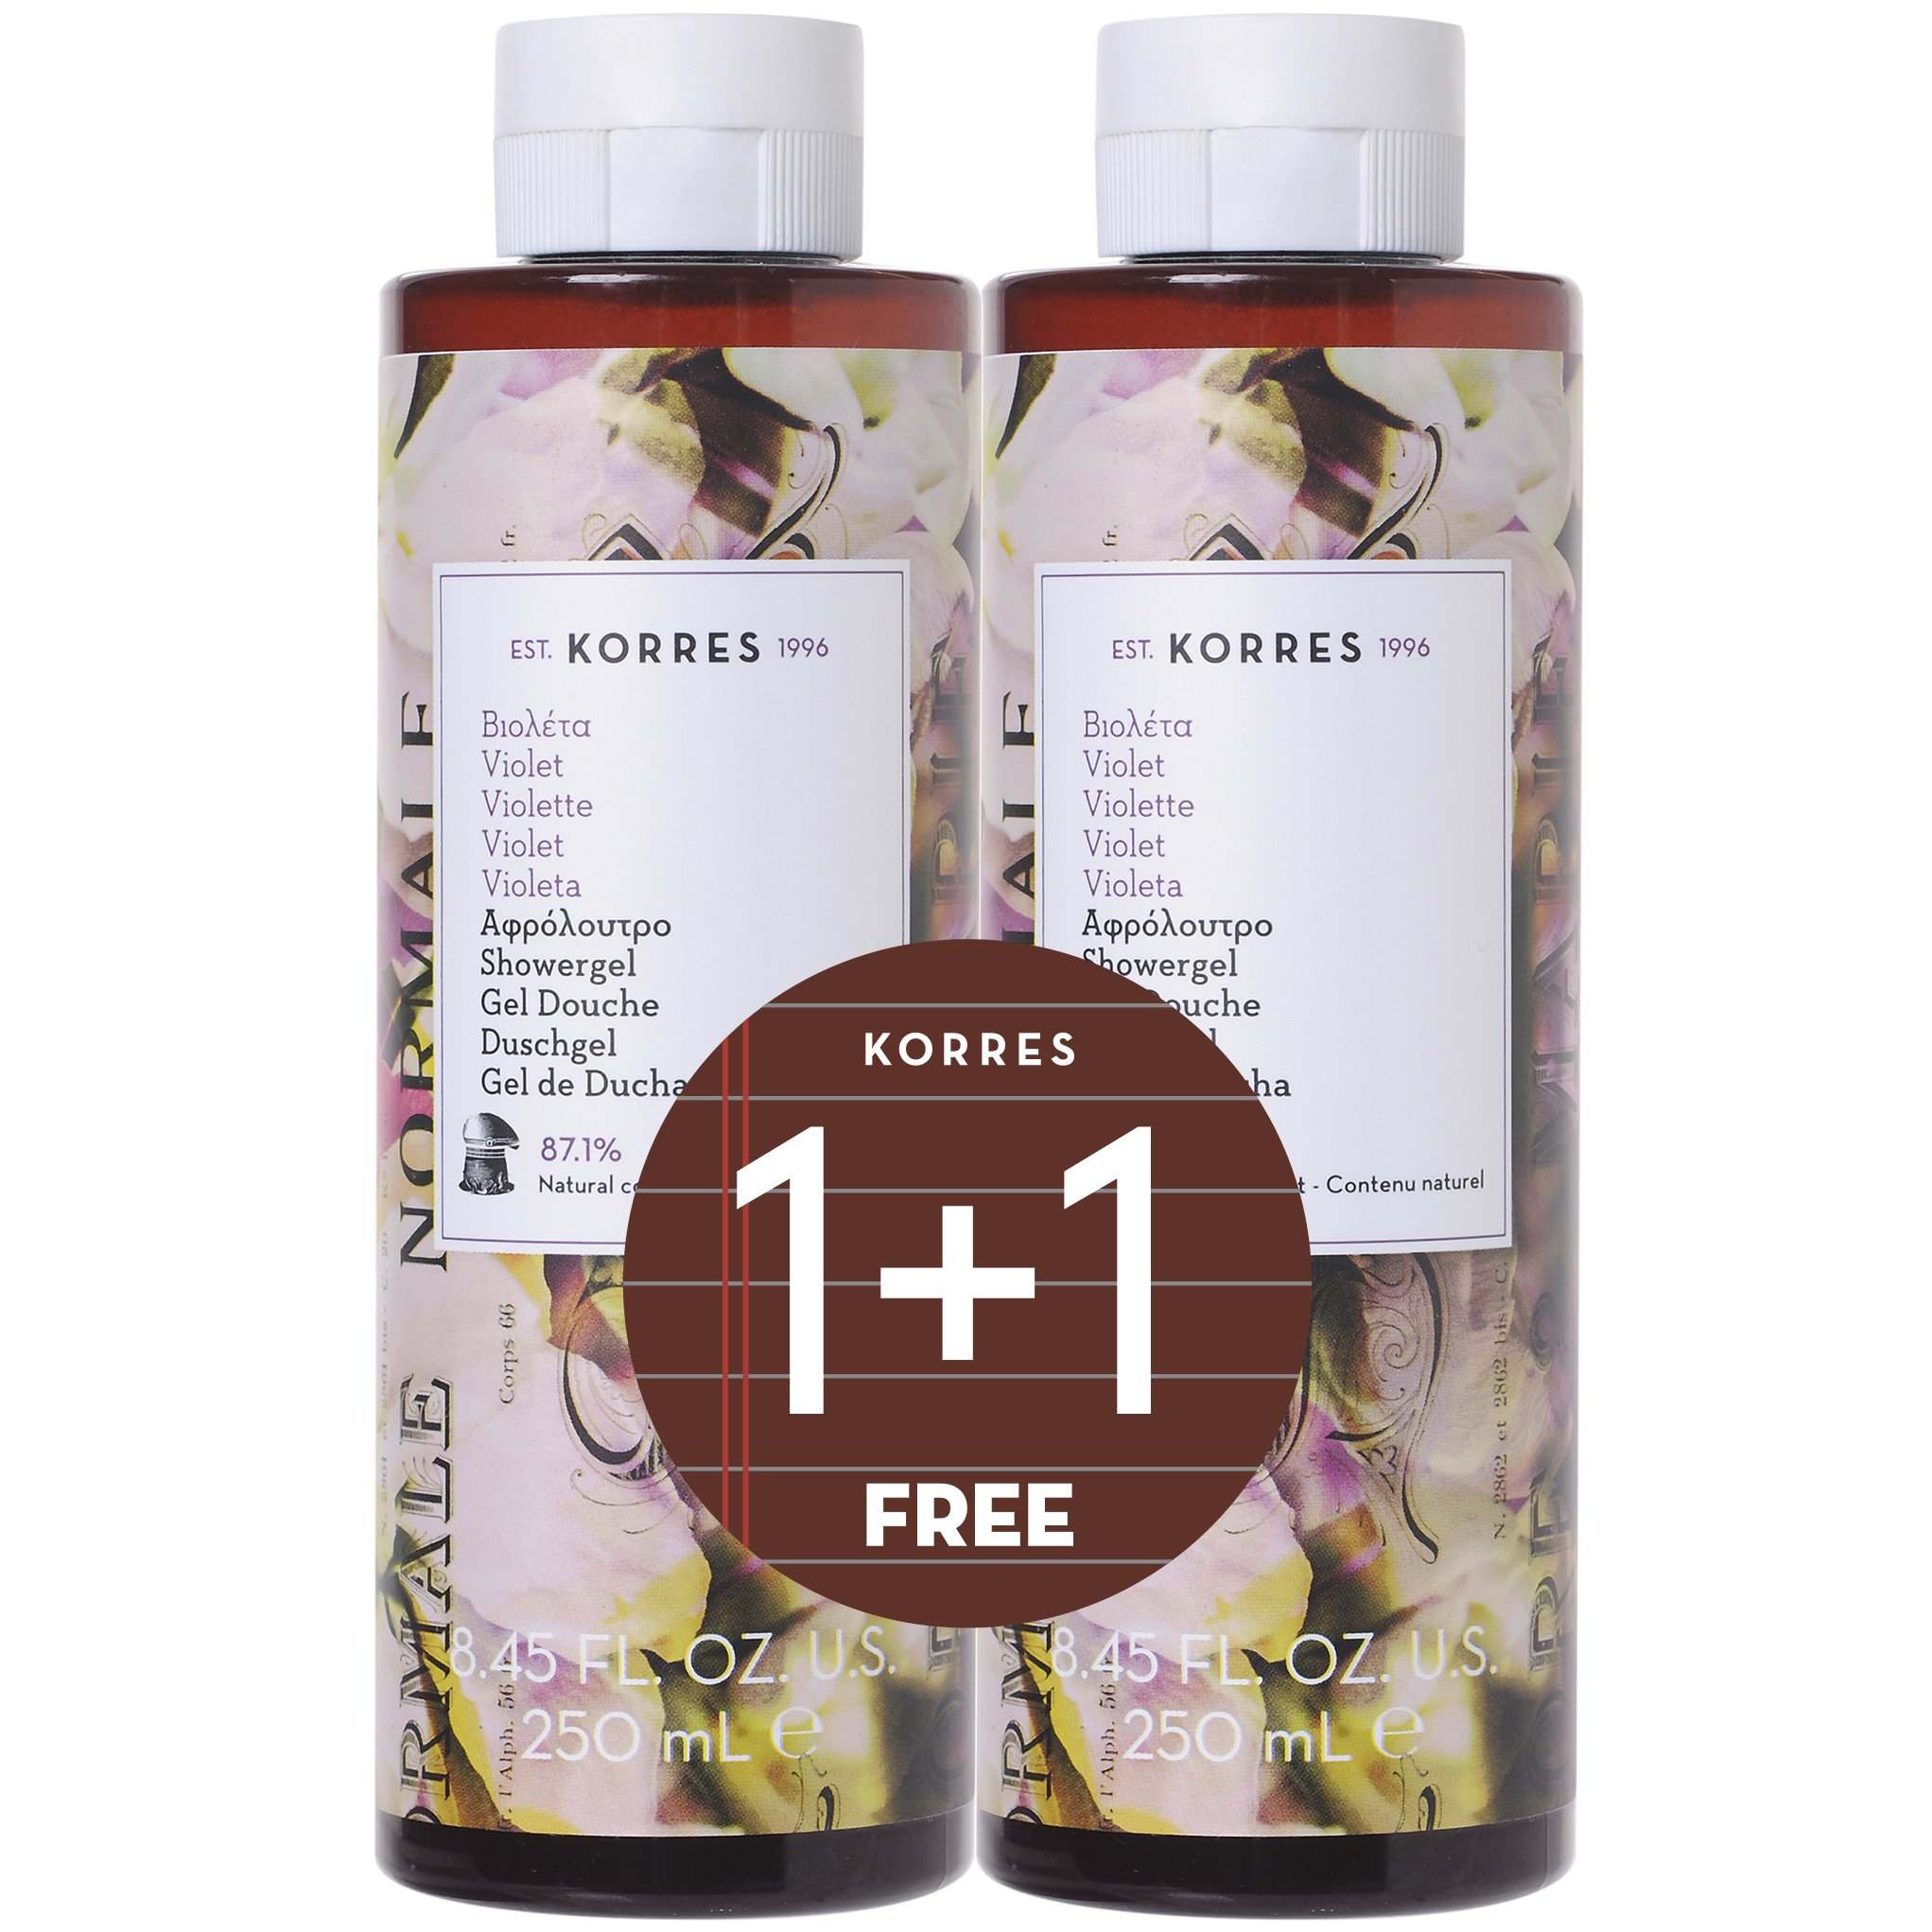 Korres Πακέτο Προσφοράς Shower Gel Violet Αφρόλουτρο, Γλυκό Πουδρένιο Άρωμα Βιολέτας με Απαλές Φρουτώδεις Νότες 2x250ml 1+1 Δώρο